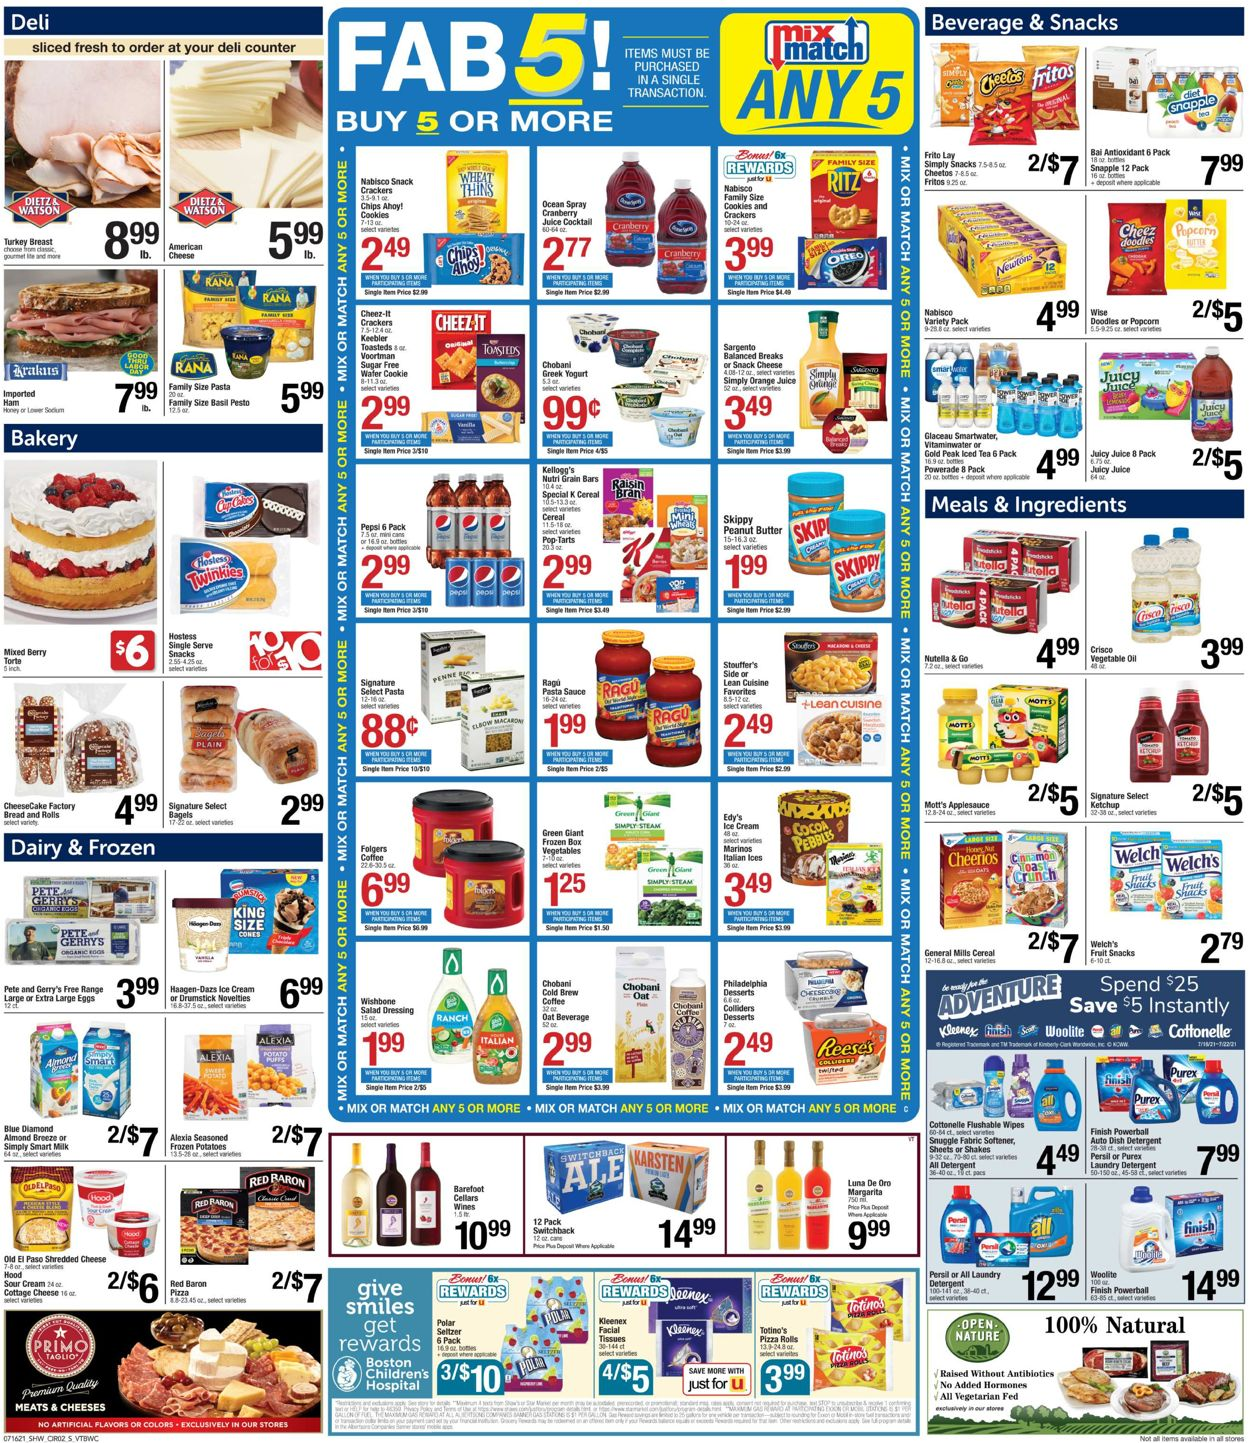 Shaw's Weekly Ad Circular - valid 07/16-07/22/2021 (Page 4)